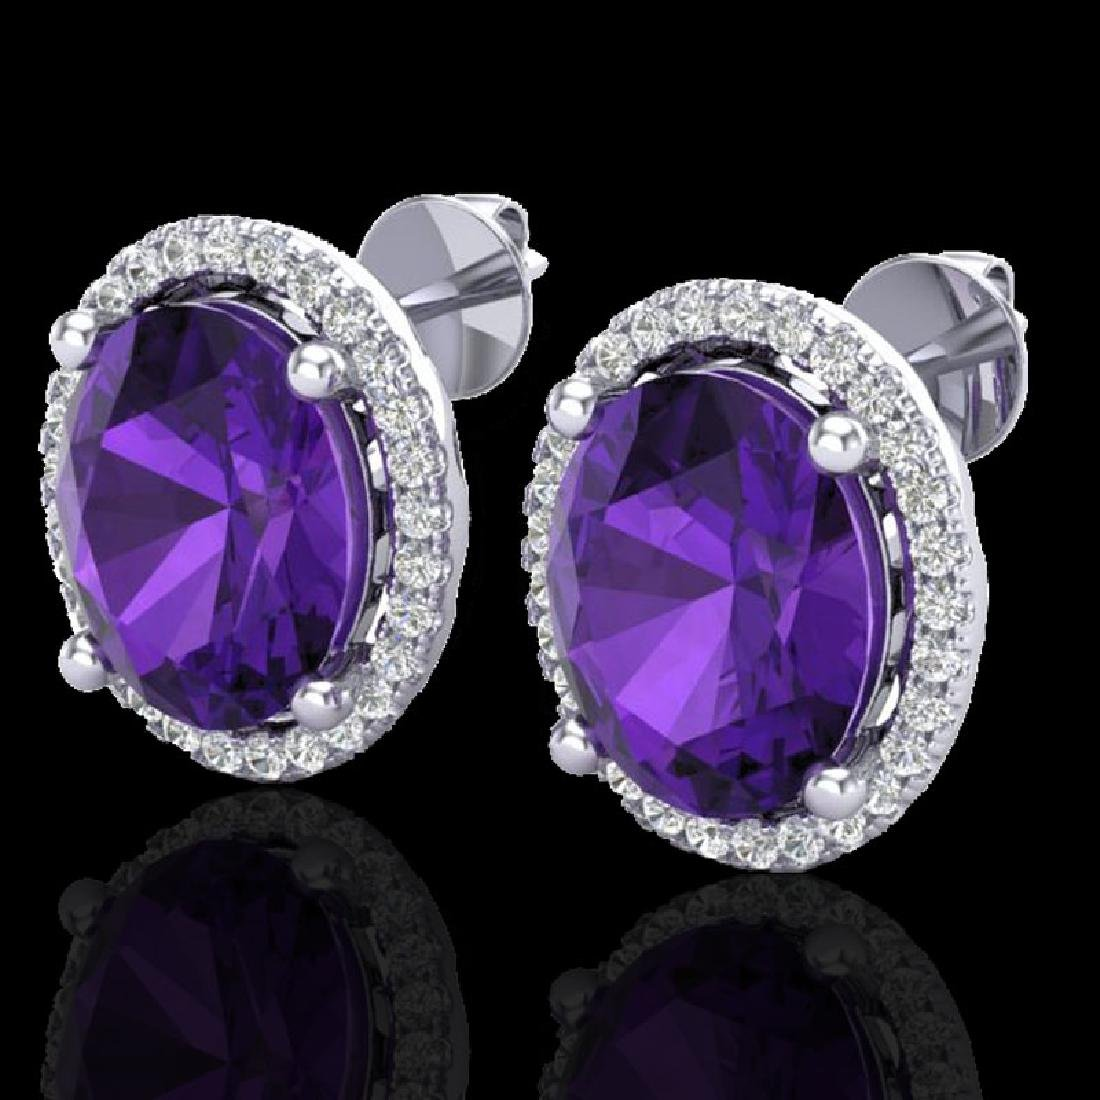 5 CTW Amethyst & Micro Pave VS/SI Diamond Earrings Halo